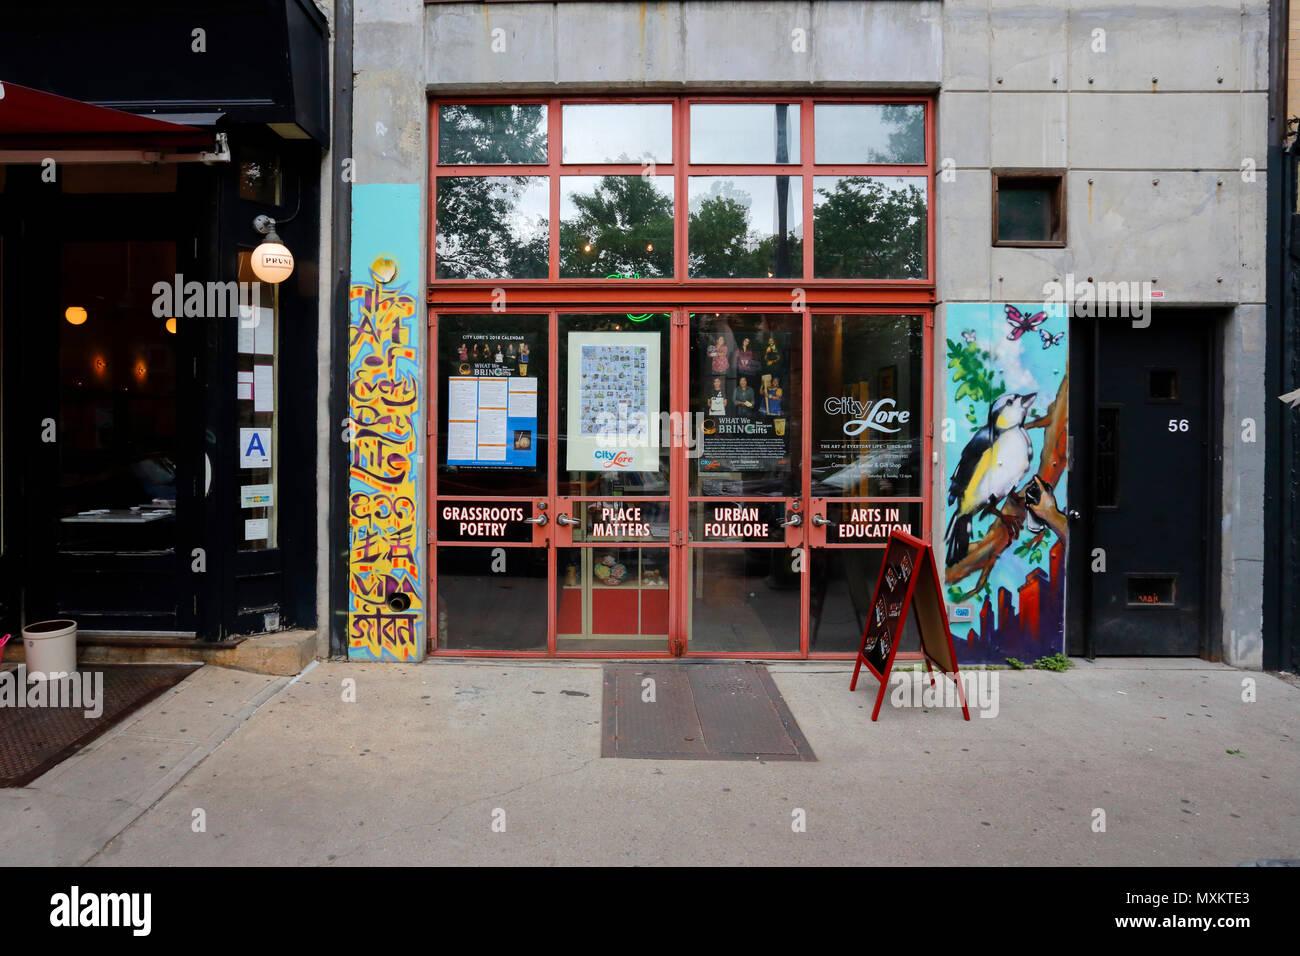 Stadt Lore, Lore Art Gallery, 56 E 1 St, New York, NY Stockbild